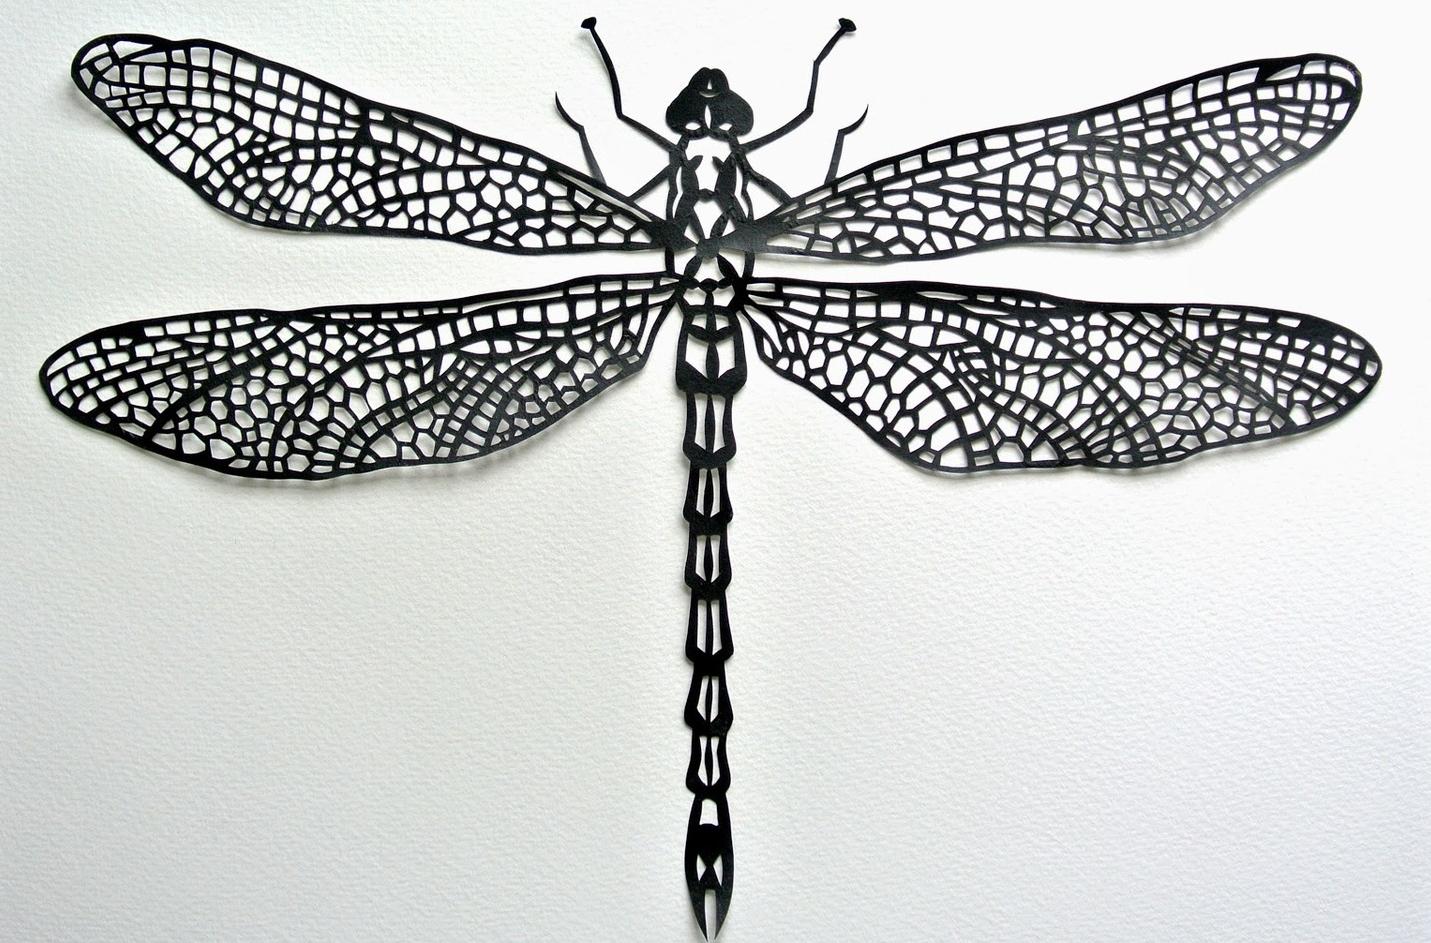 Dragonfly_byGillGutherie